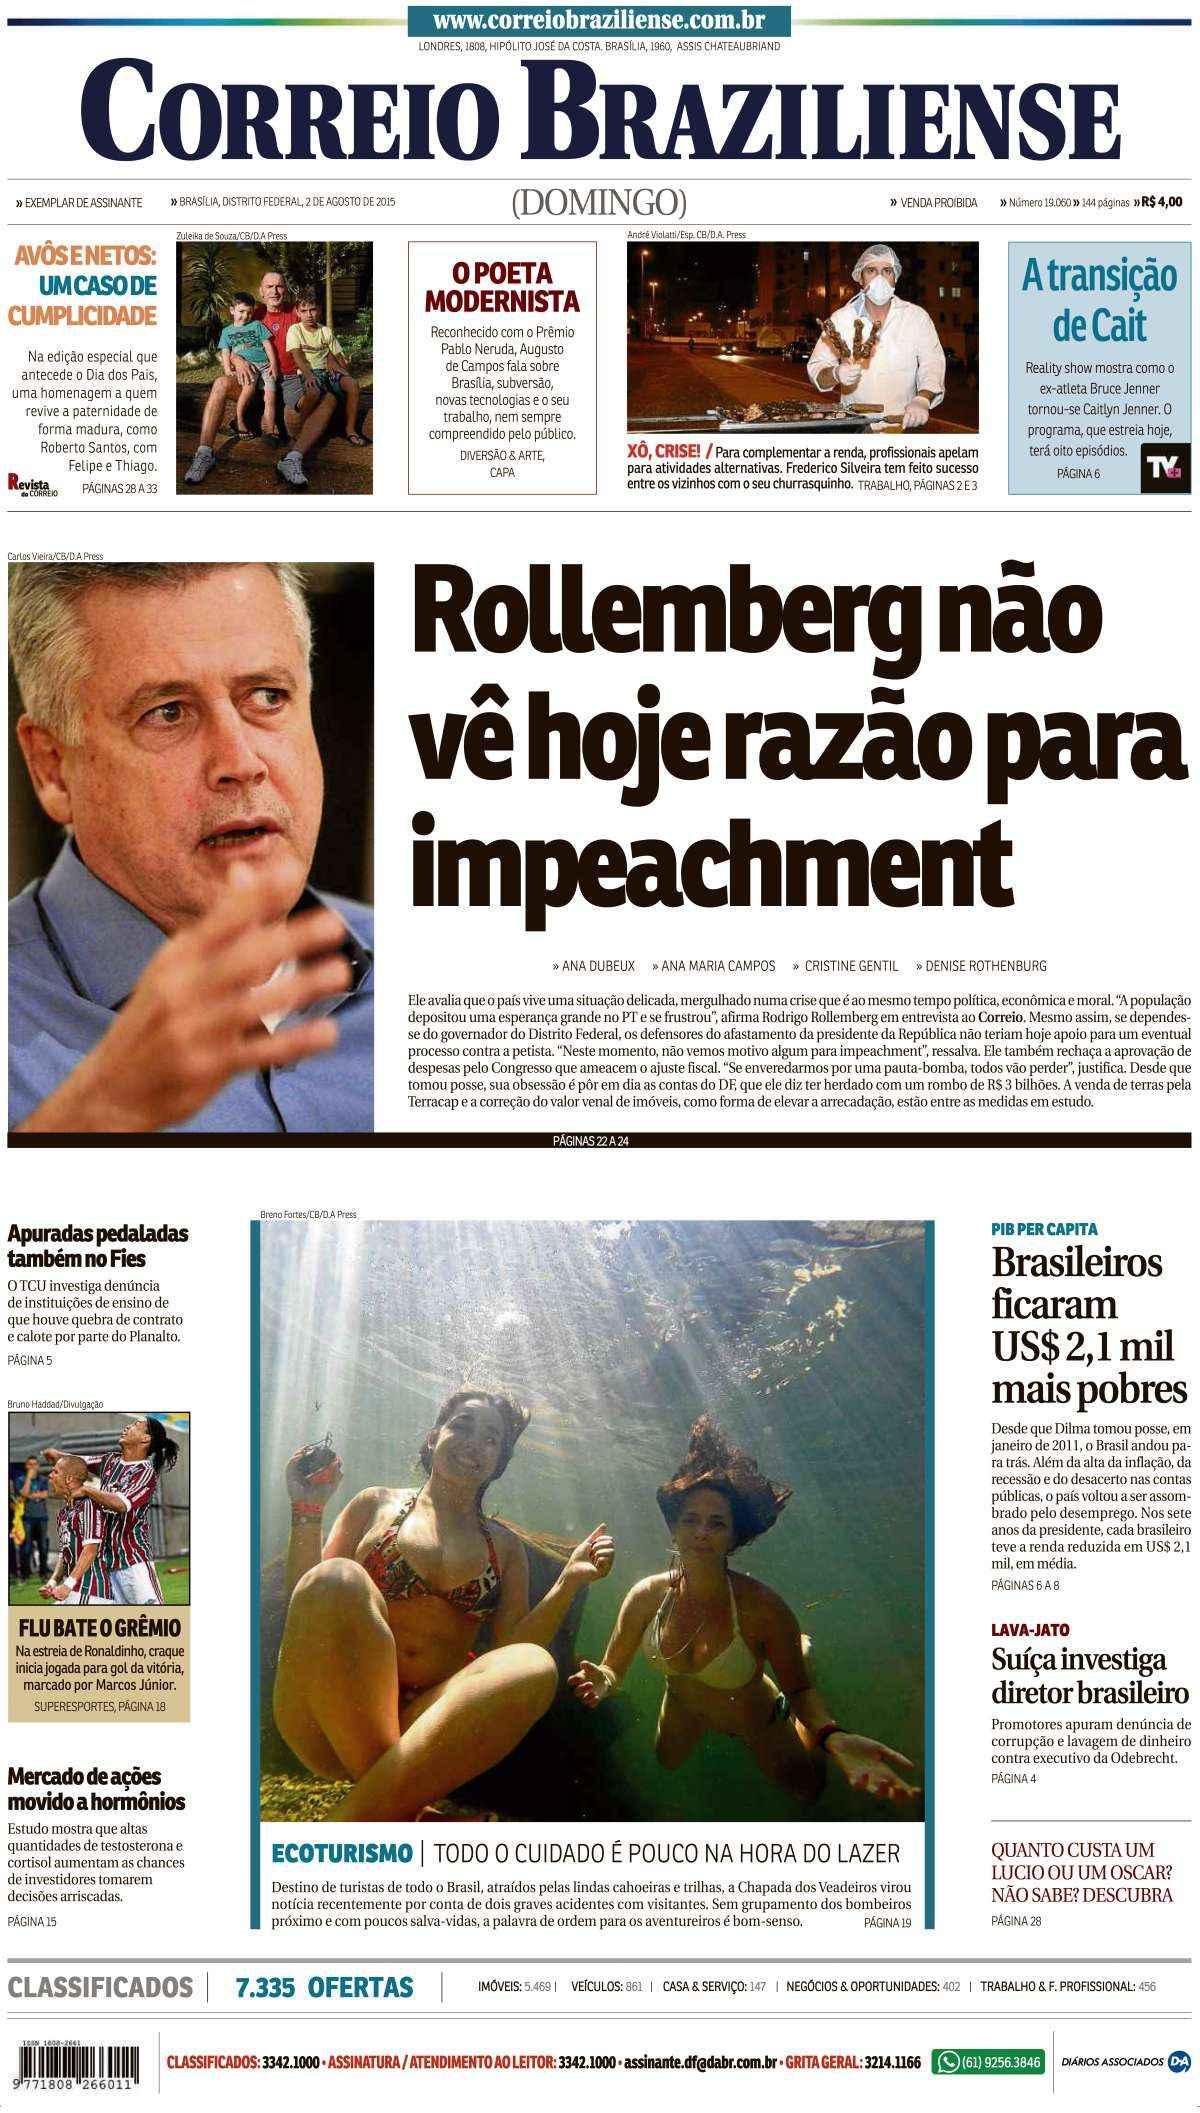 Correio Braziliense, 02 de Agosto de 2015